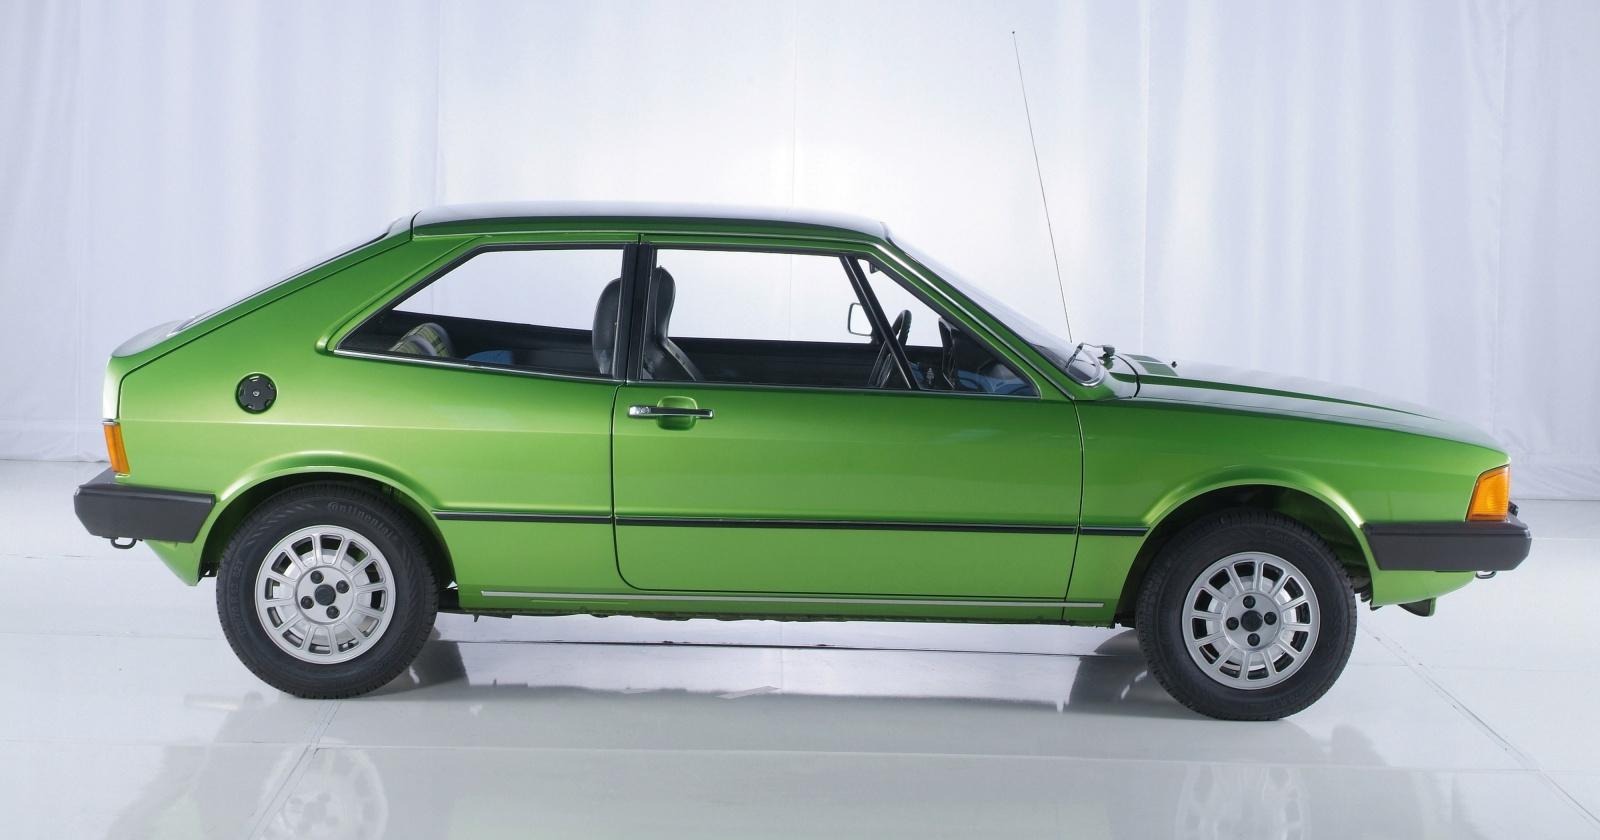 Volkswagen Scirocco I 1974 - 1981 Coupe #6